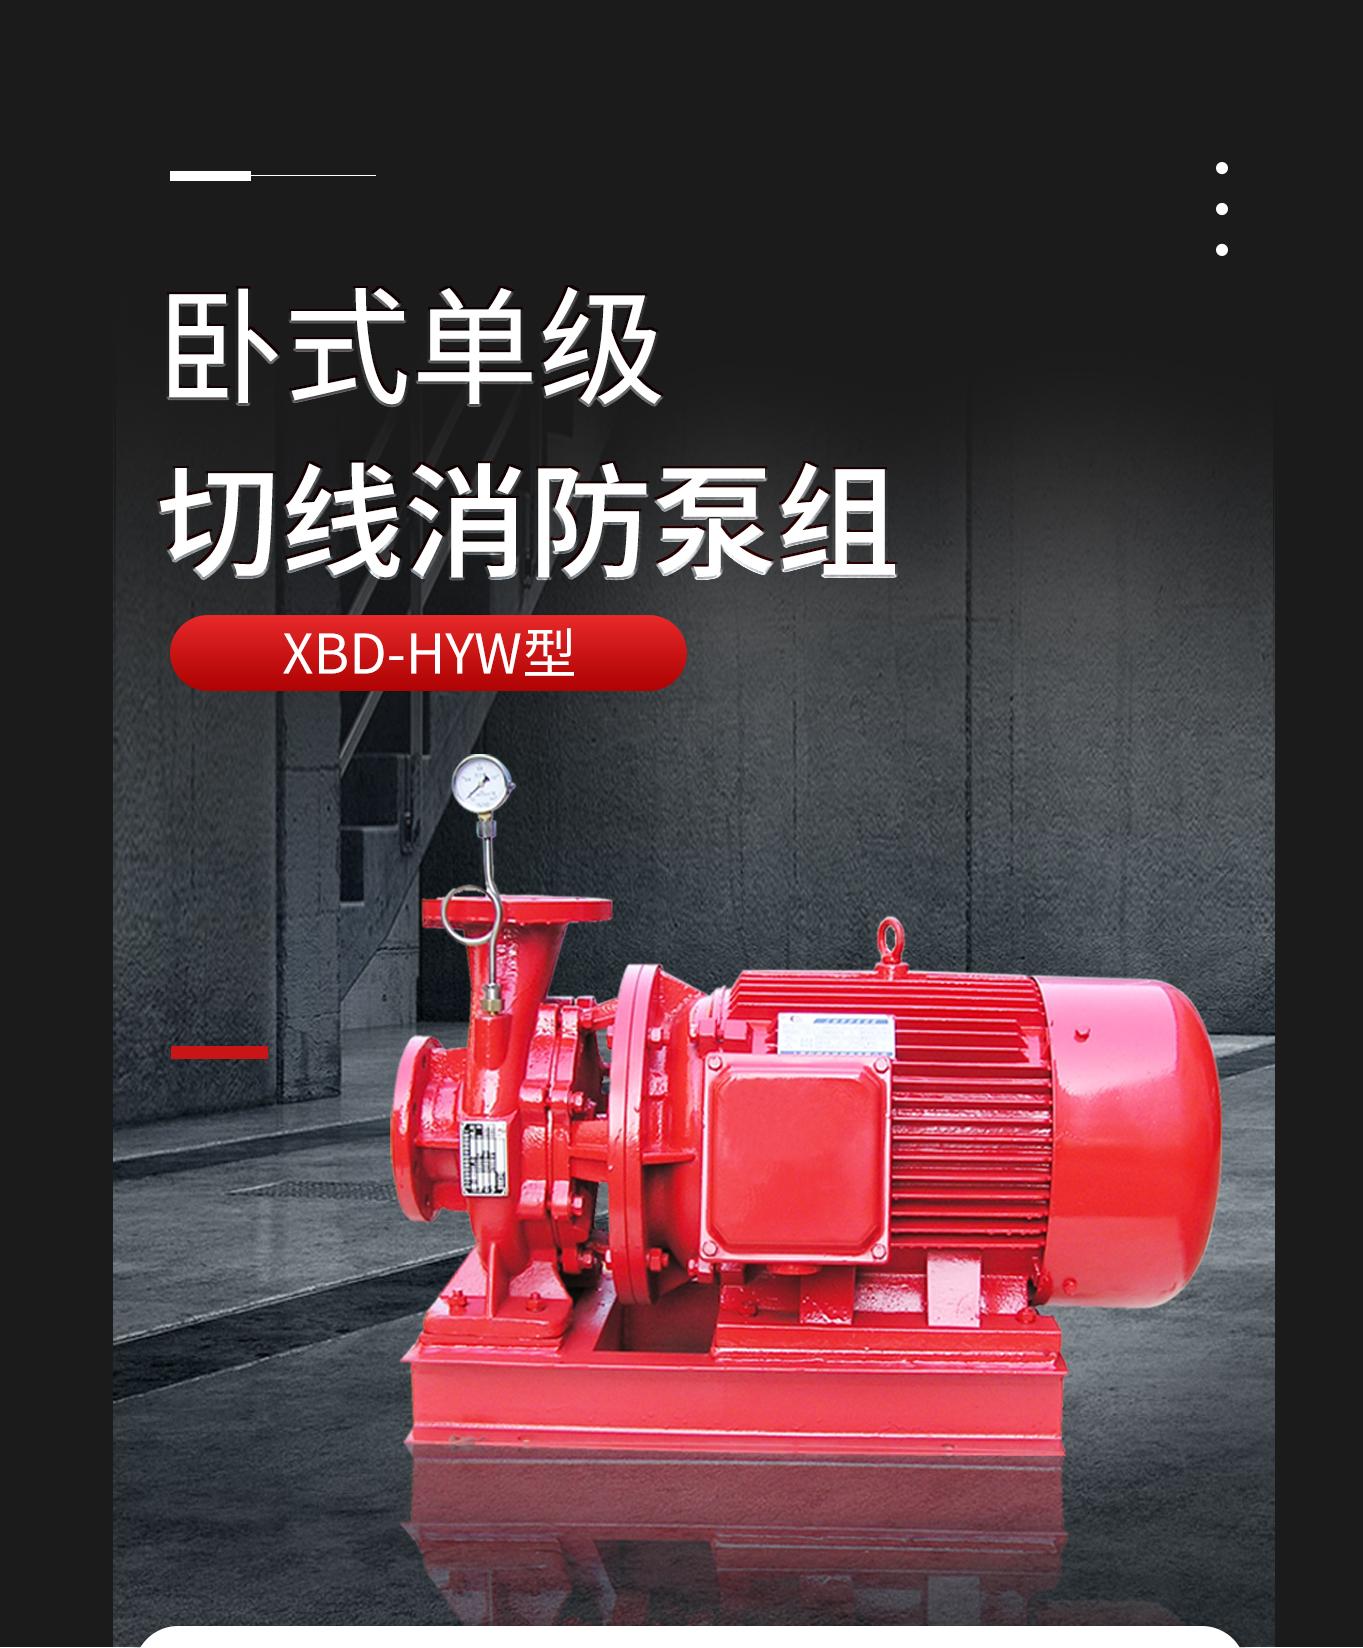 XBD-HYW型卧式单级切线消防泵组_01.jpg